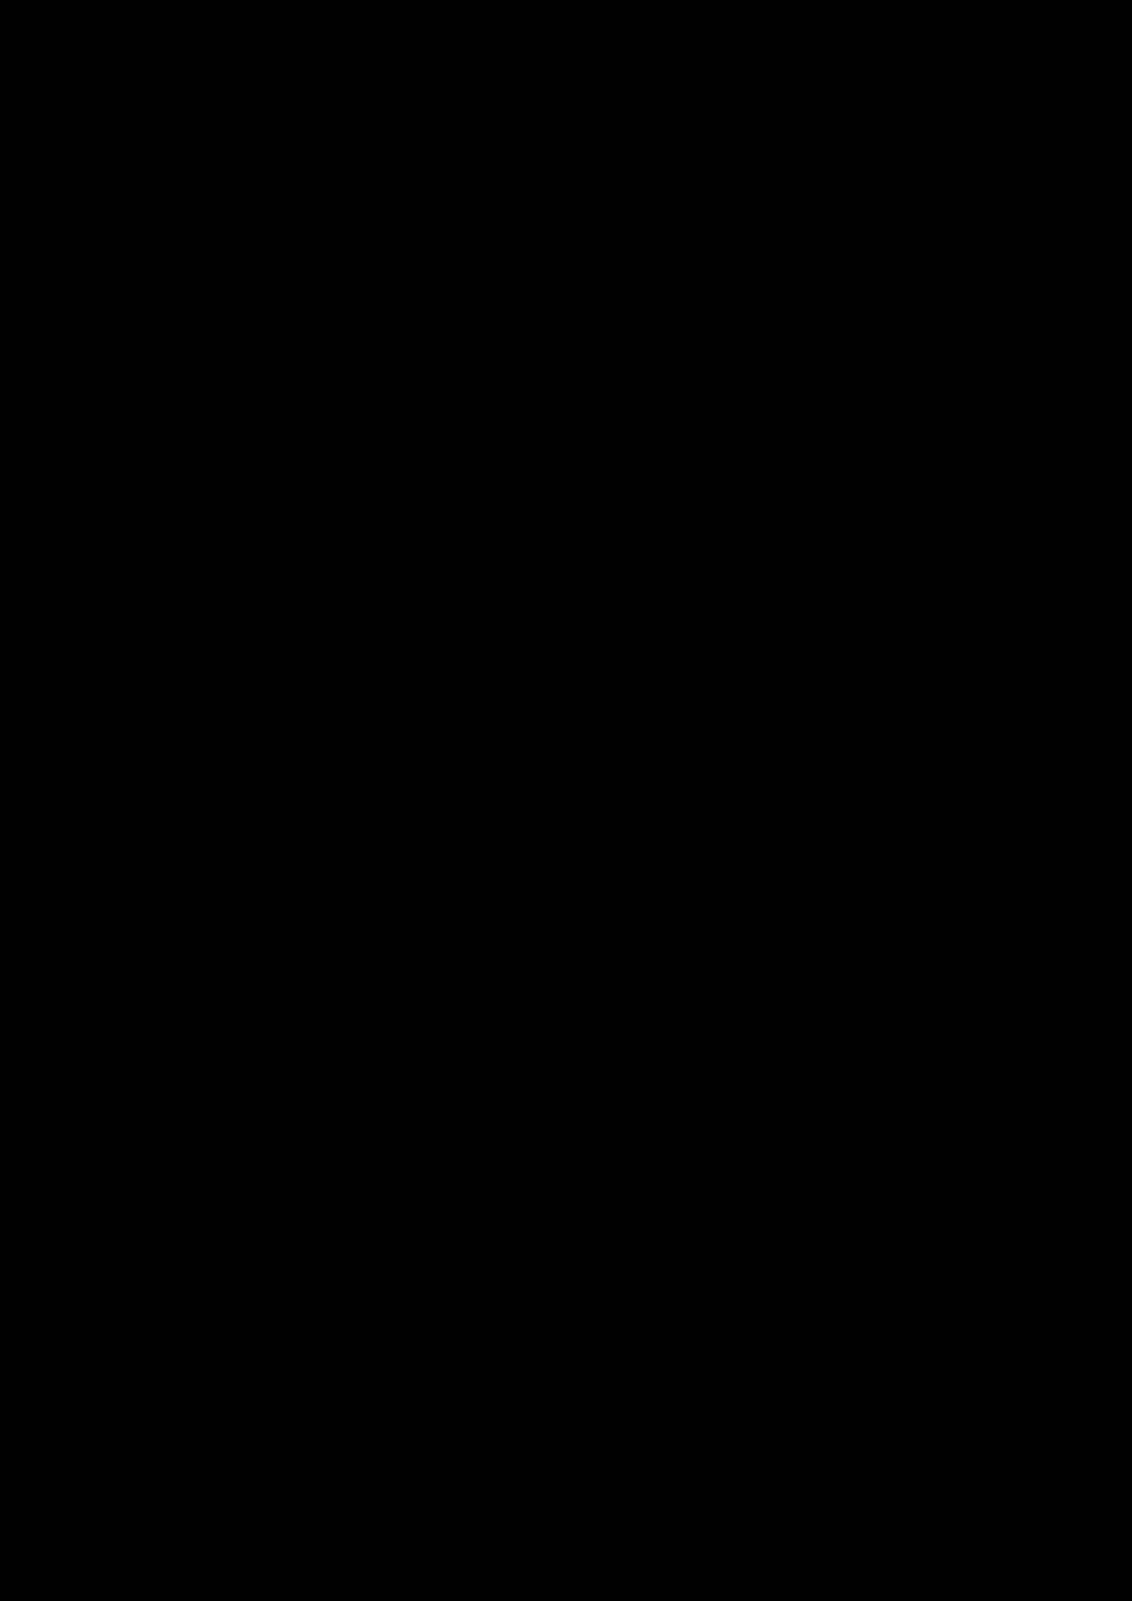 Belyiy sokol slide, Image 93